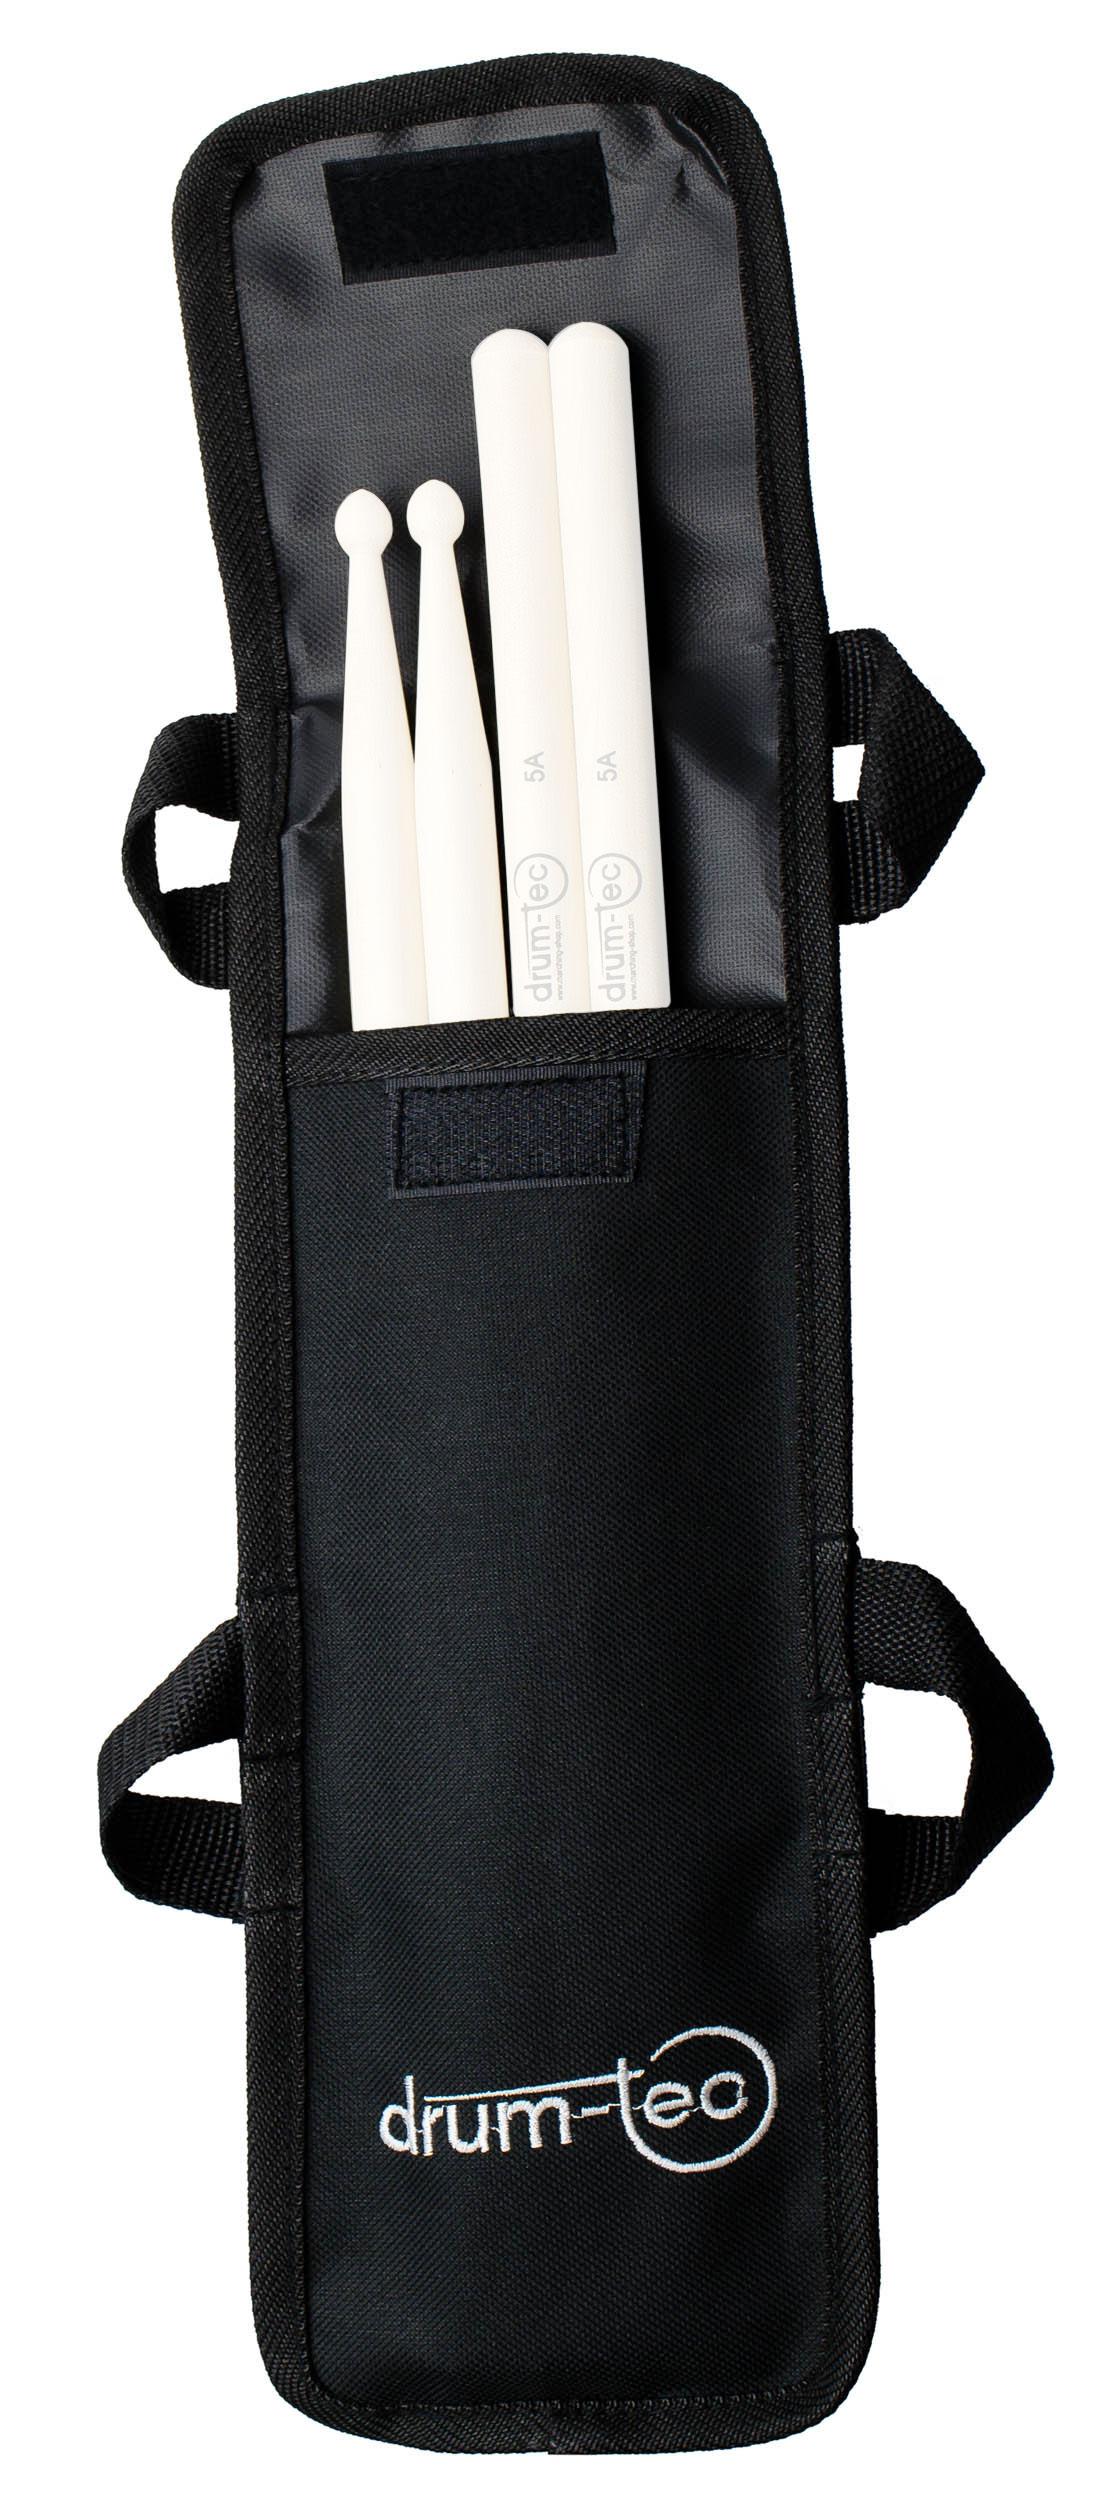 Drum Tec Stick Holder Small Bag